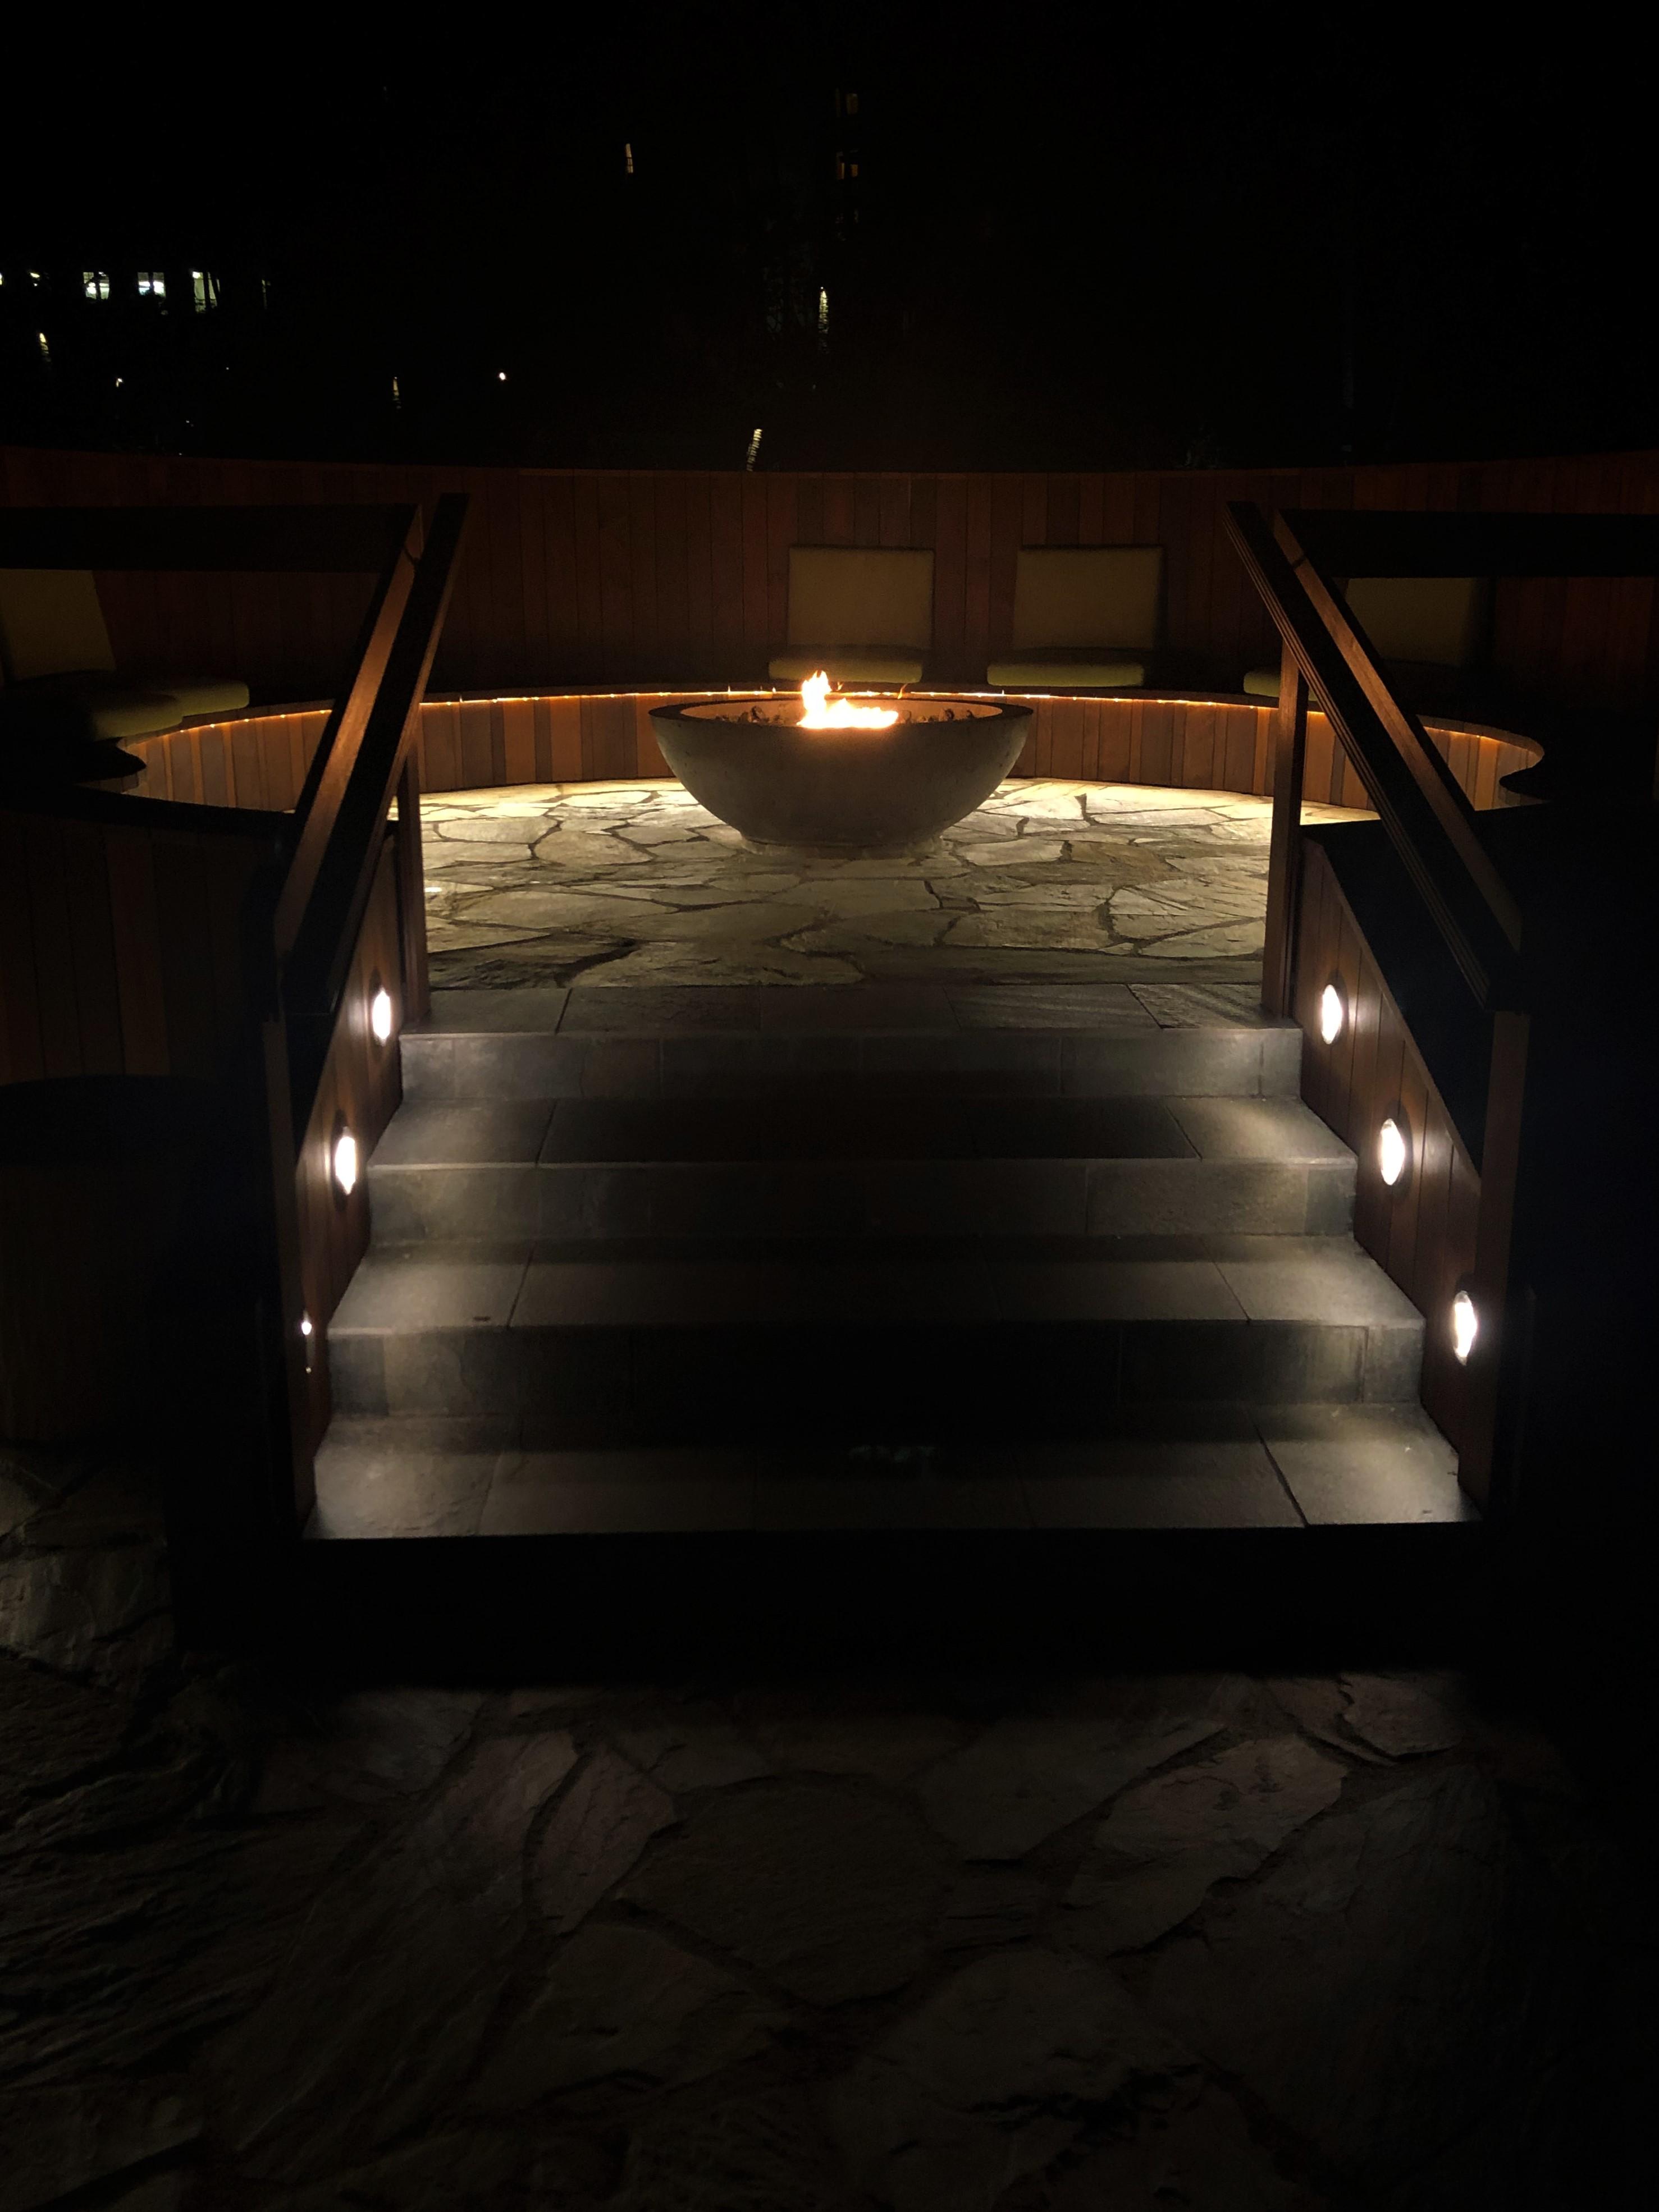 The Ritz Carlton Fire Pit Patio